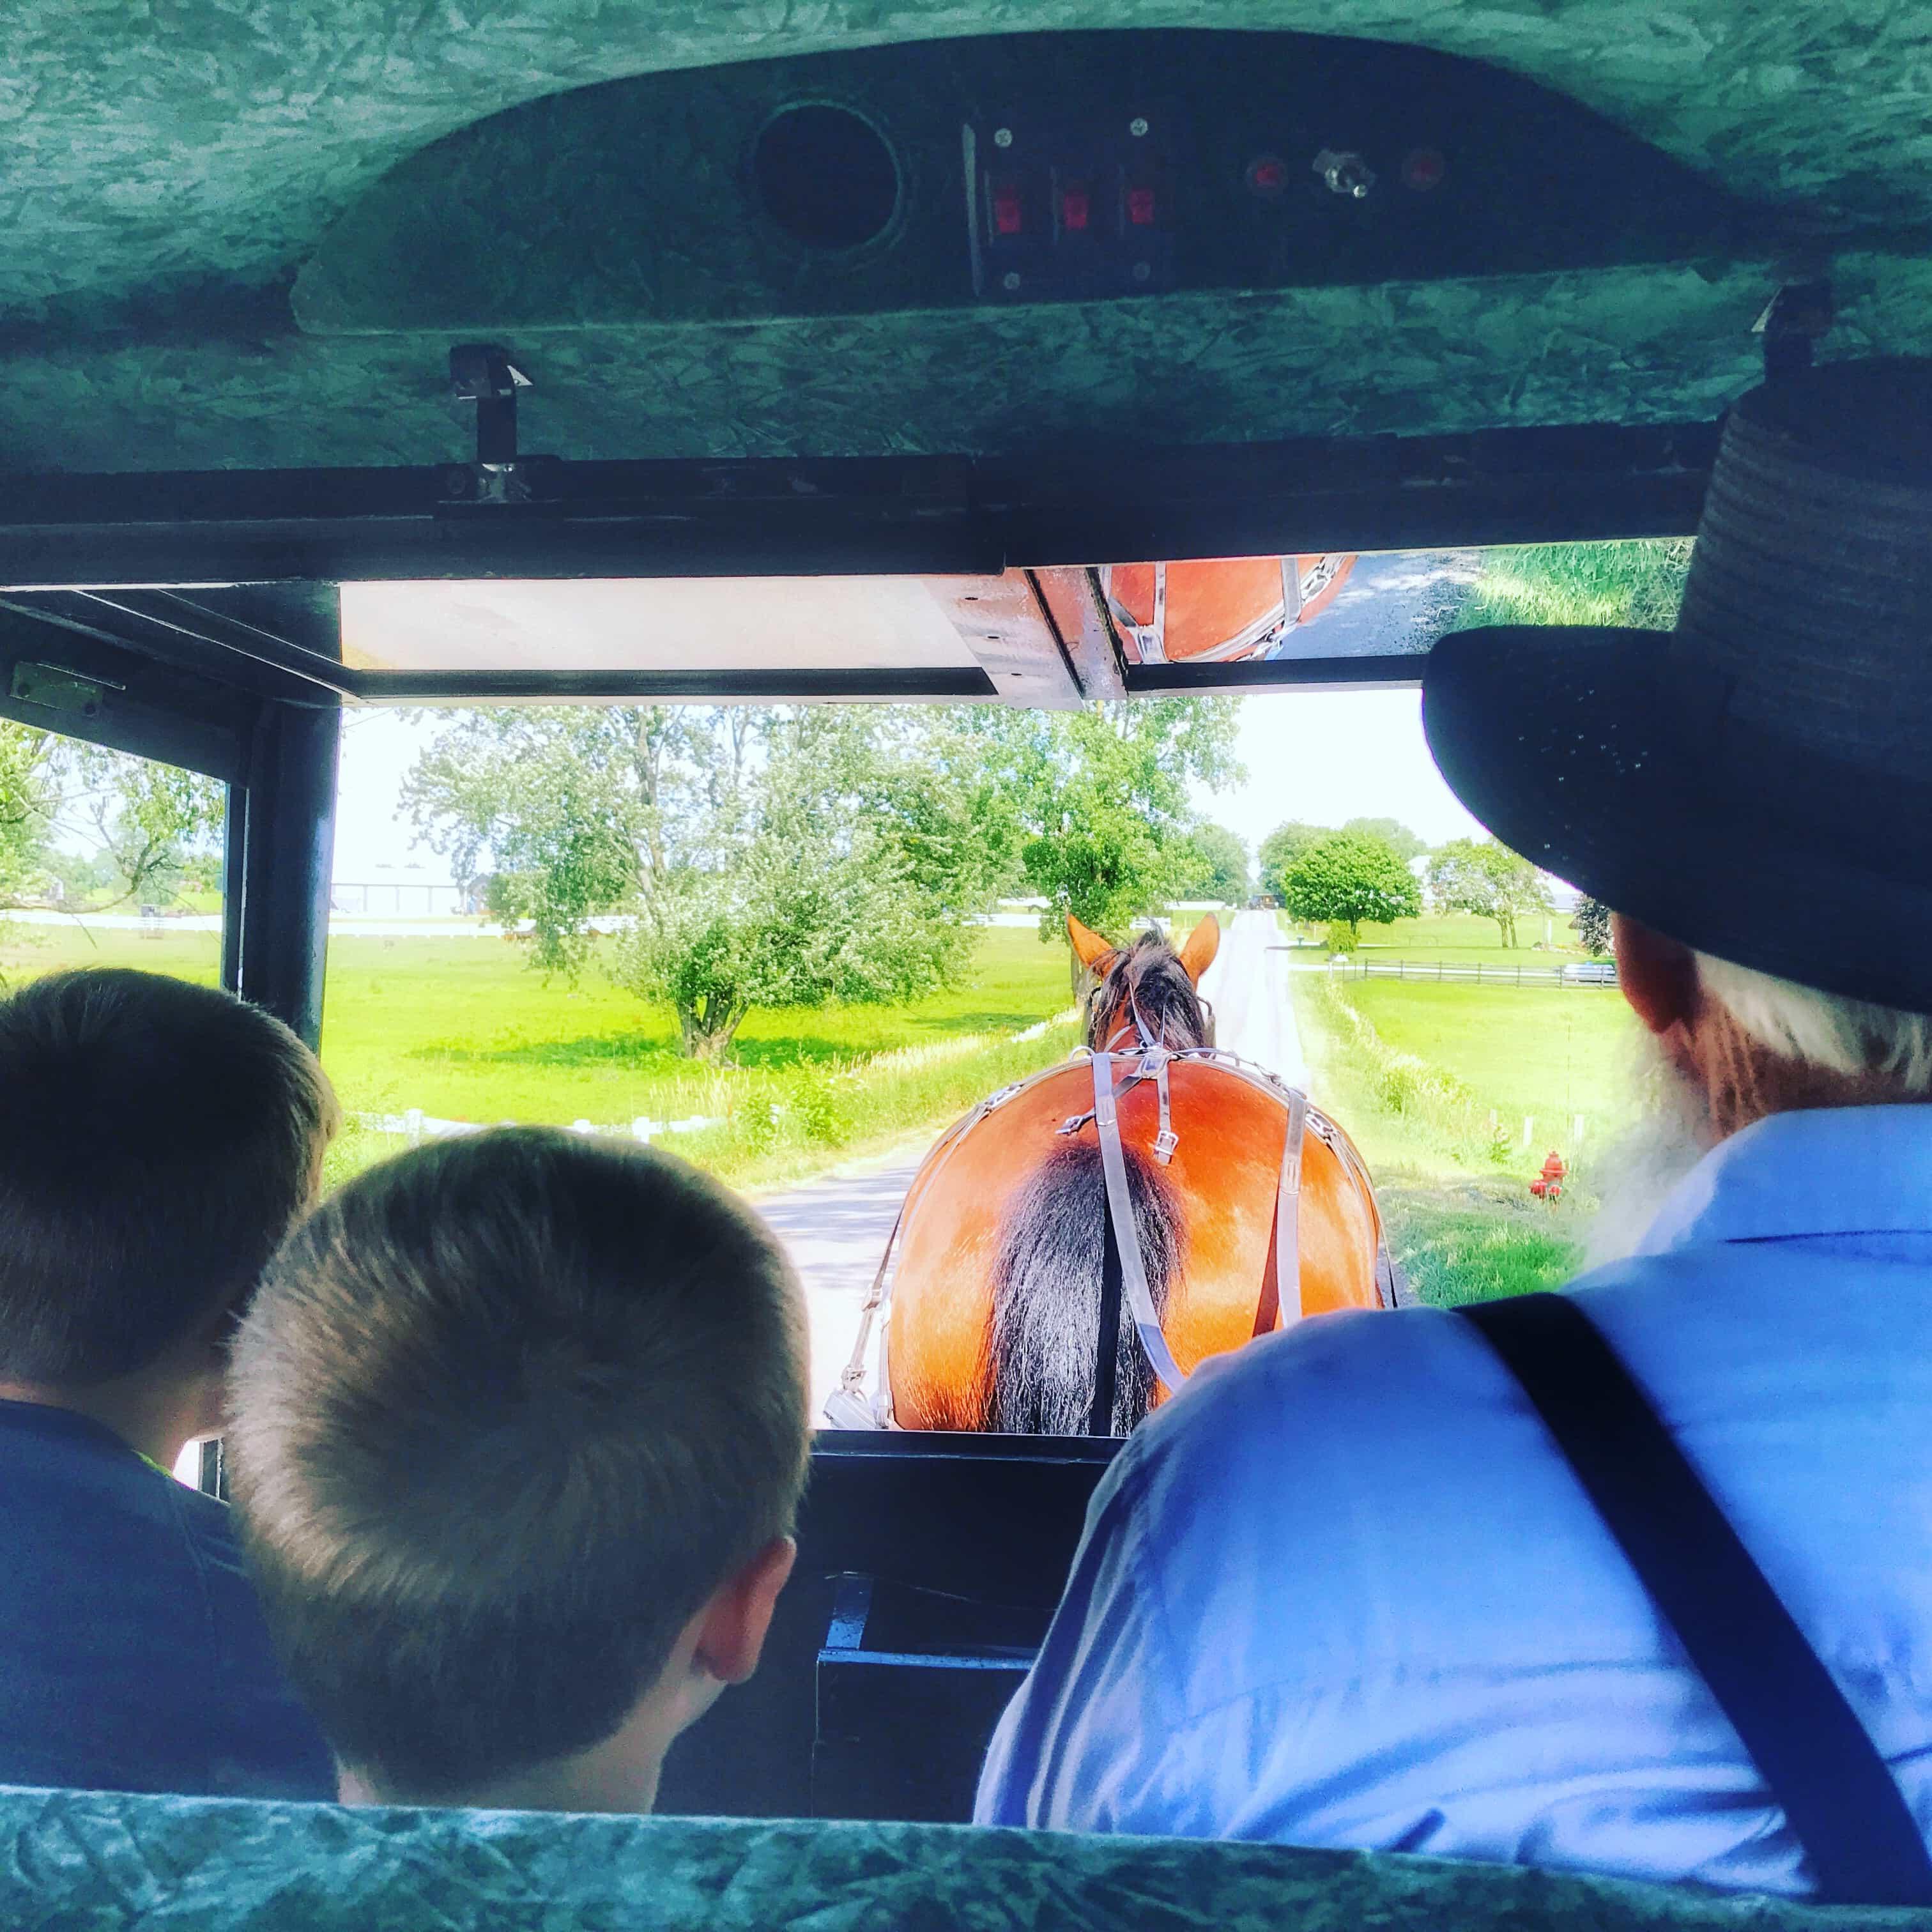 Shipshewana Indiana Experience the Amish Countryside